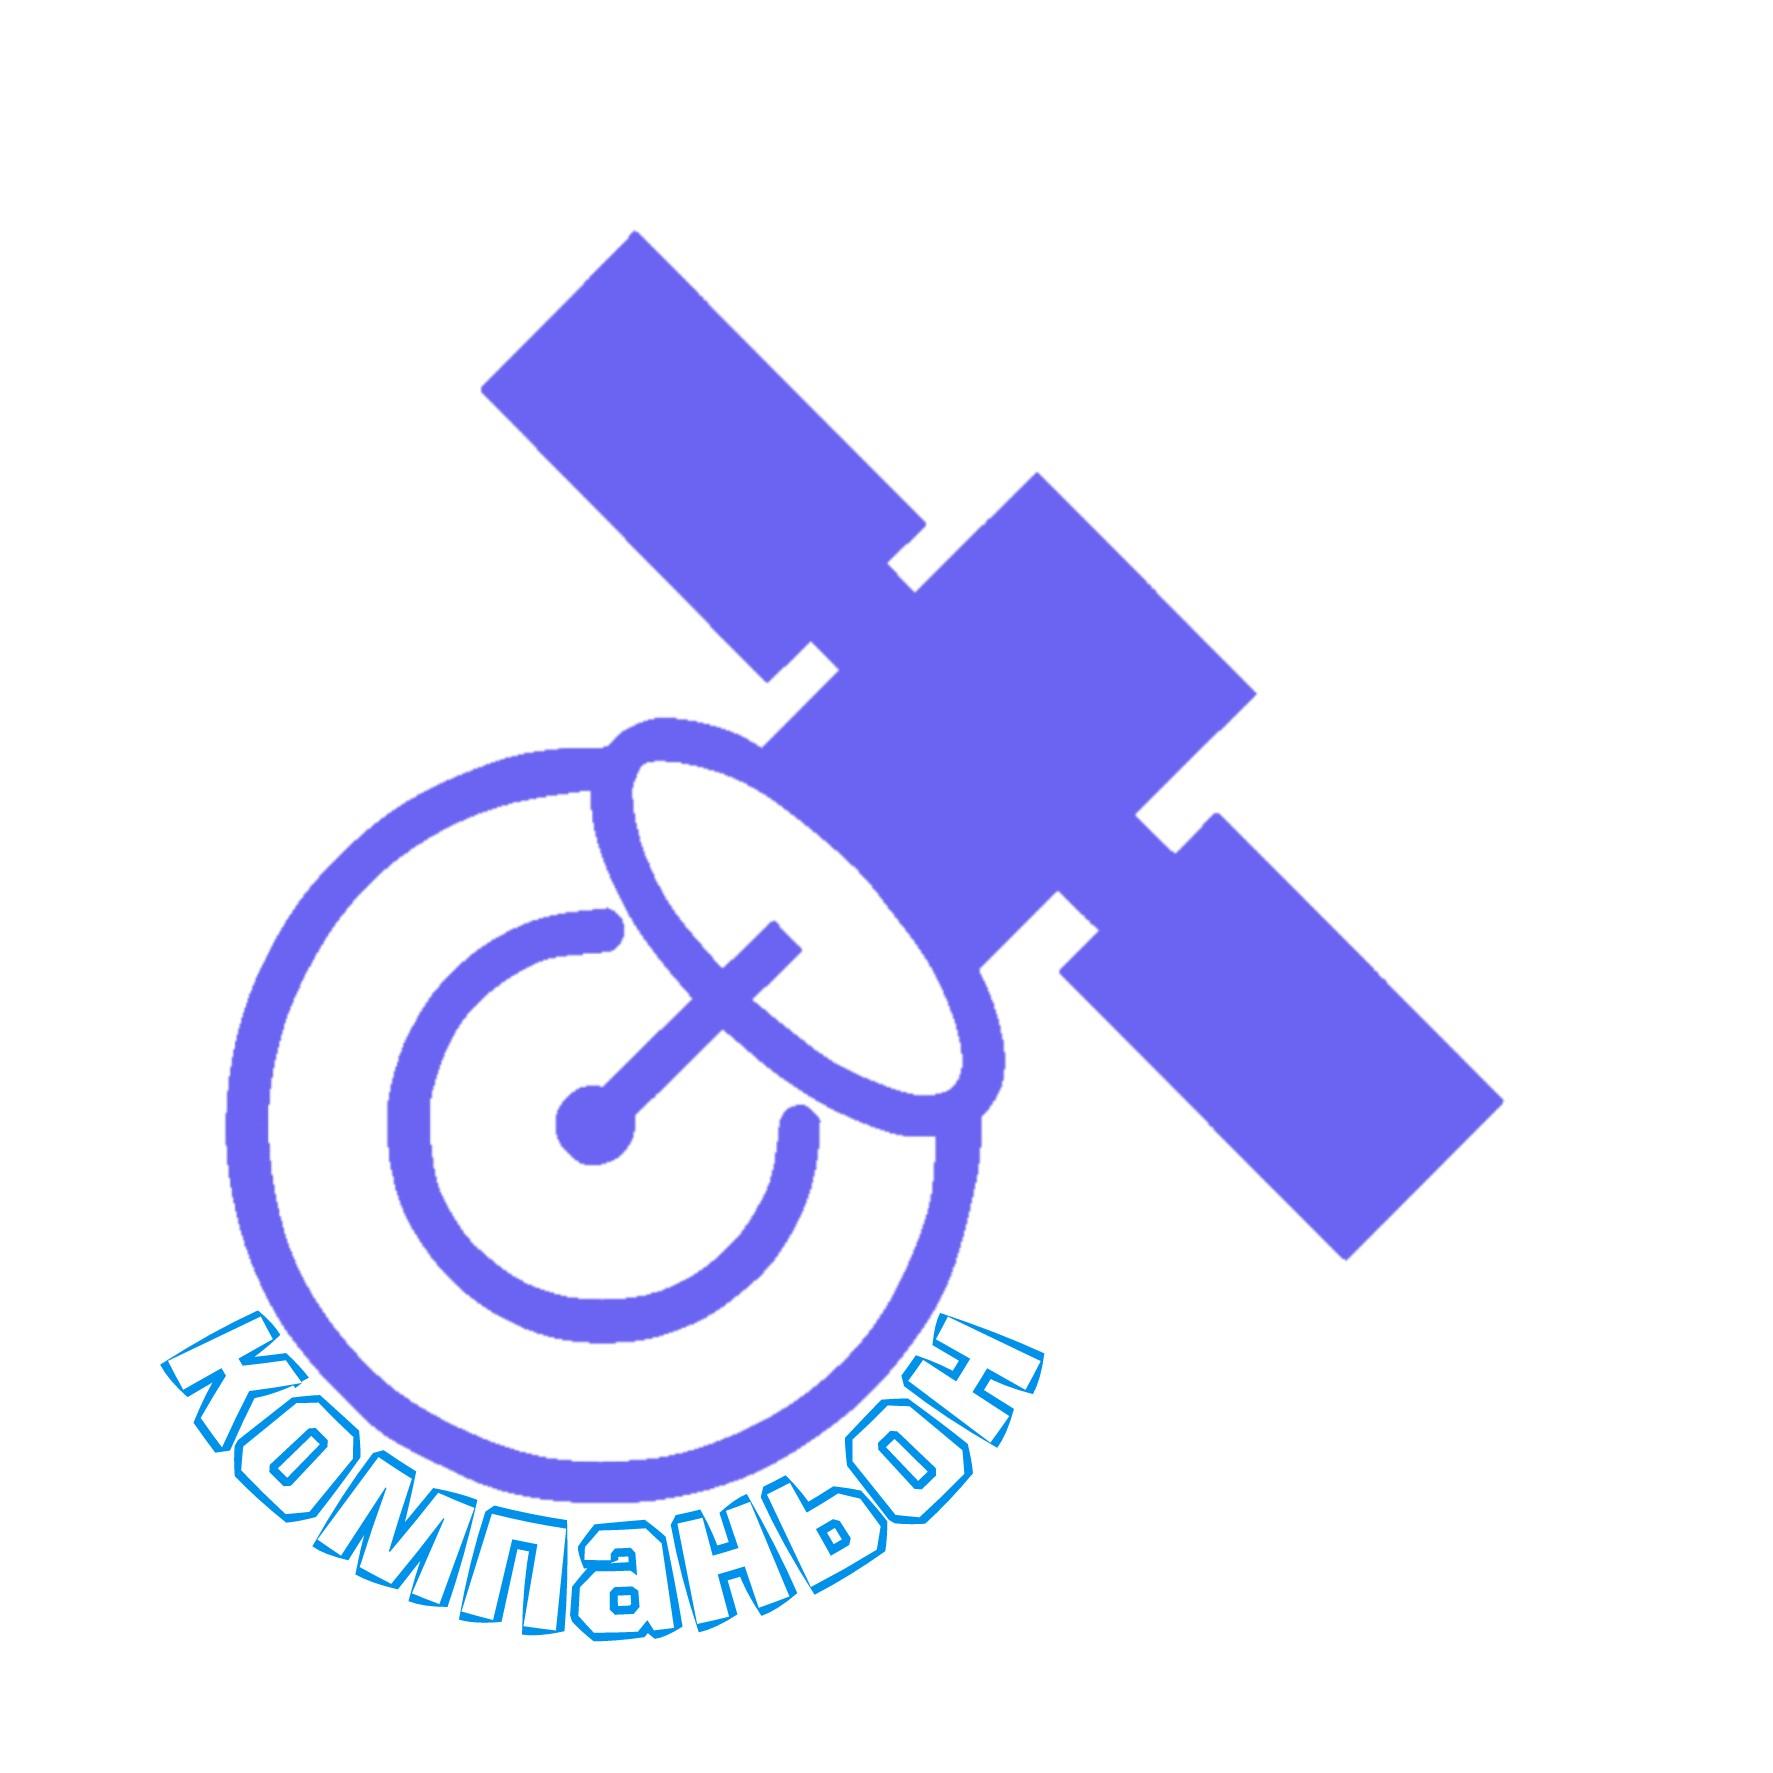 Логотип компании фото f_7755b842bf834697.jpg